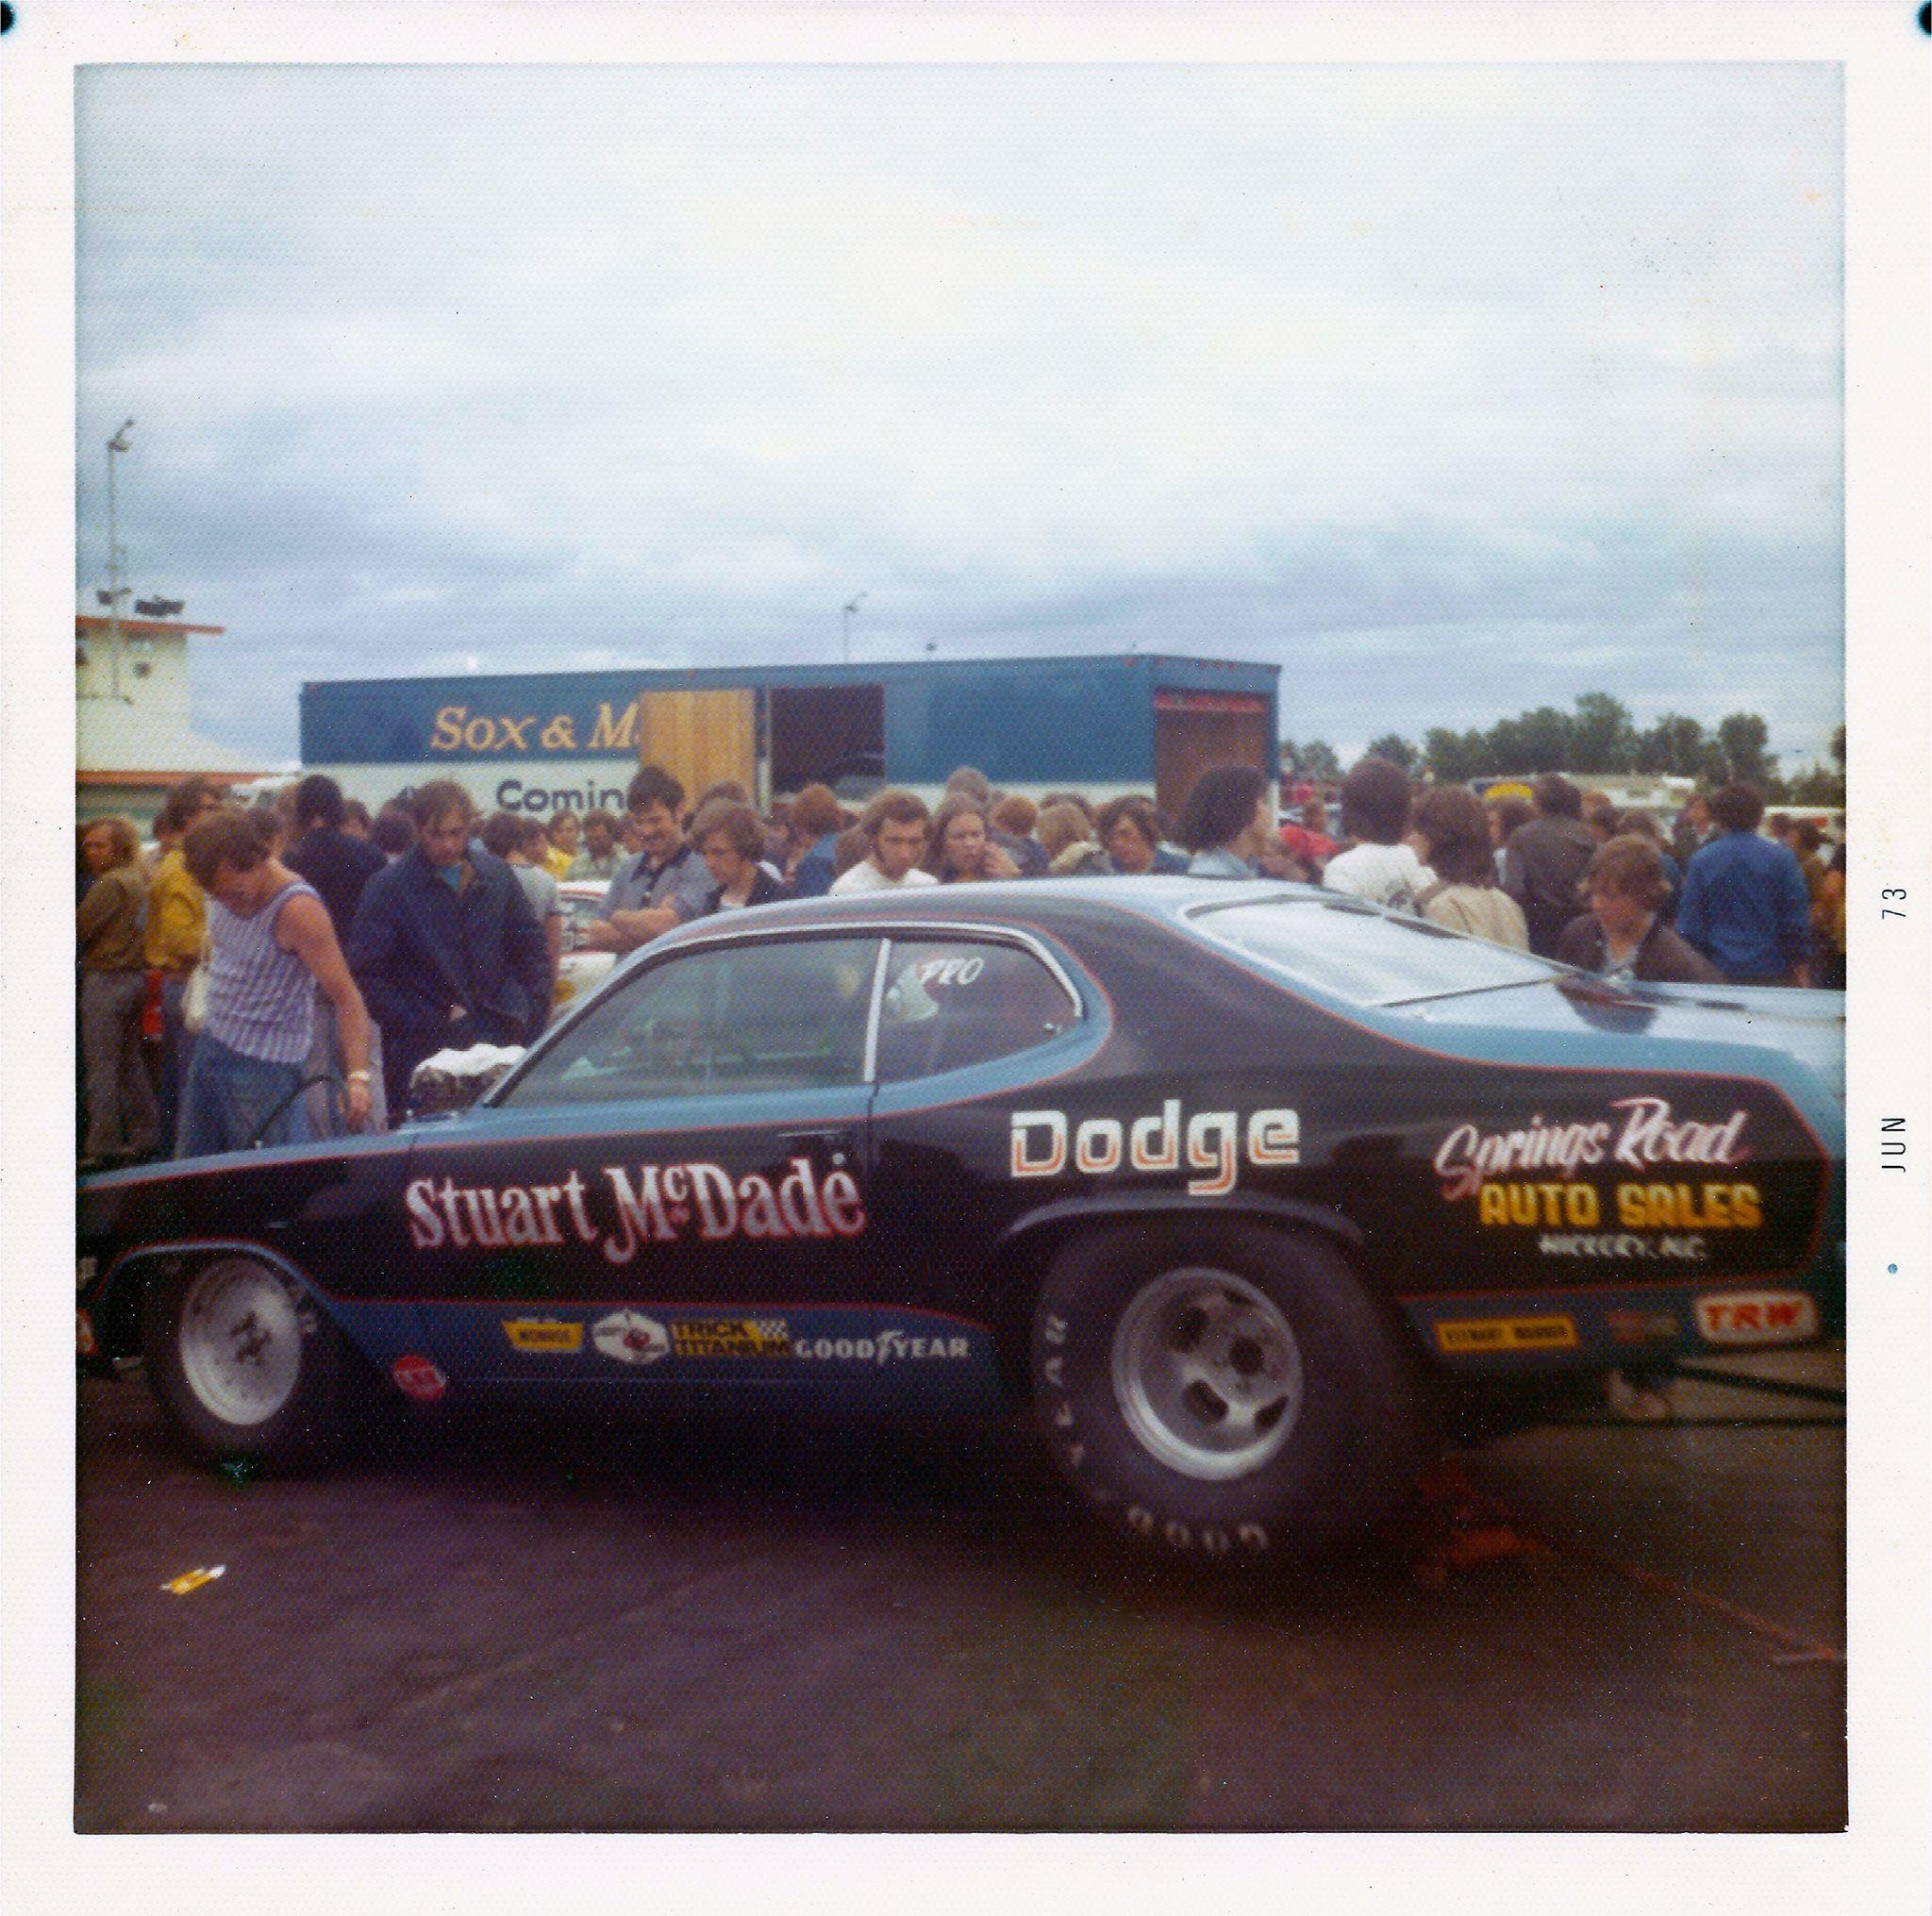 Vintage Drag Racing - Pro Stock - Stuart McDade